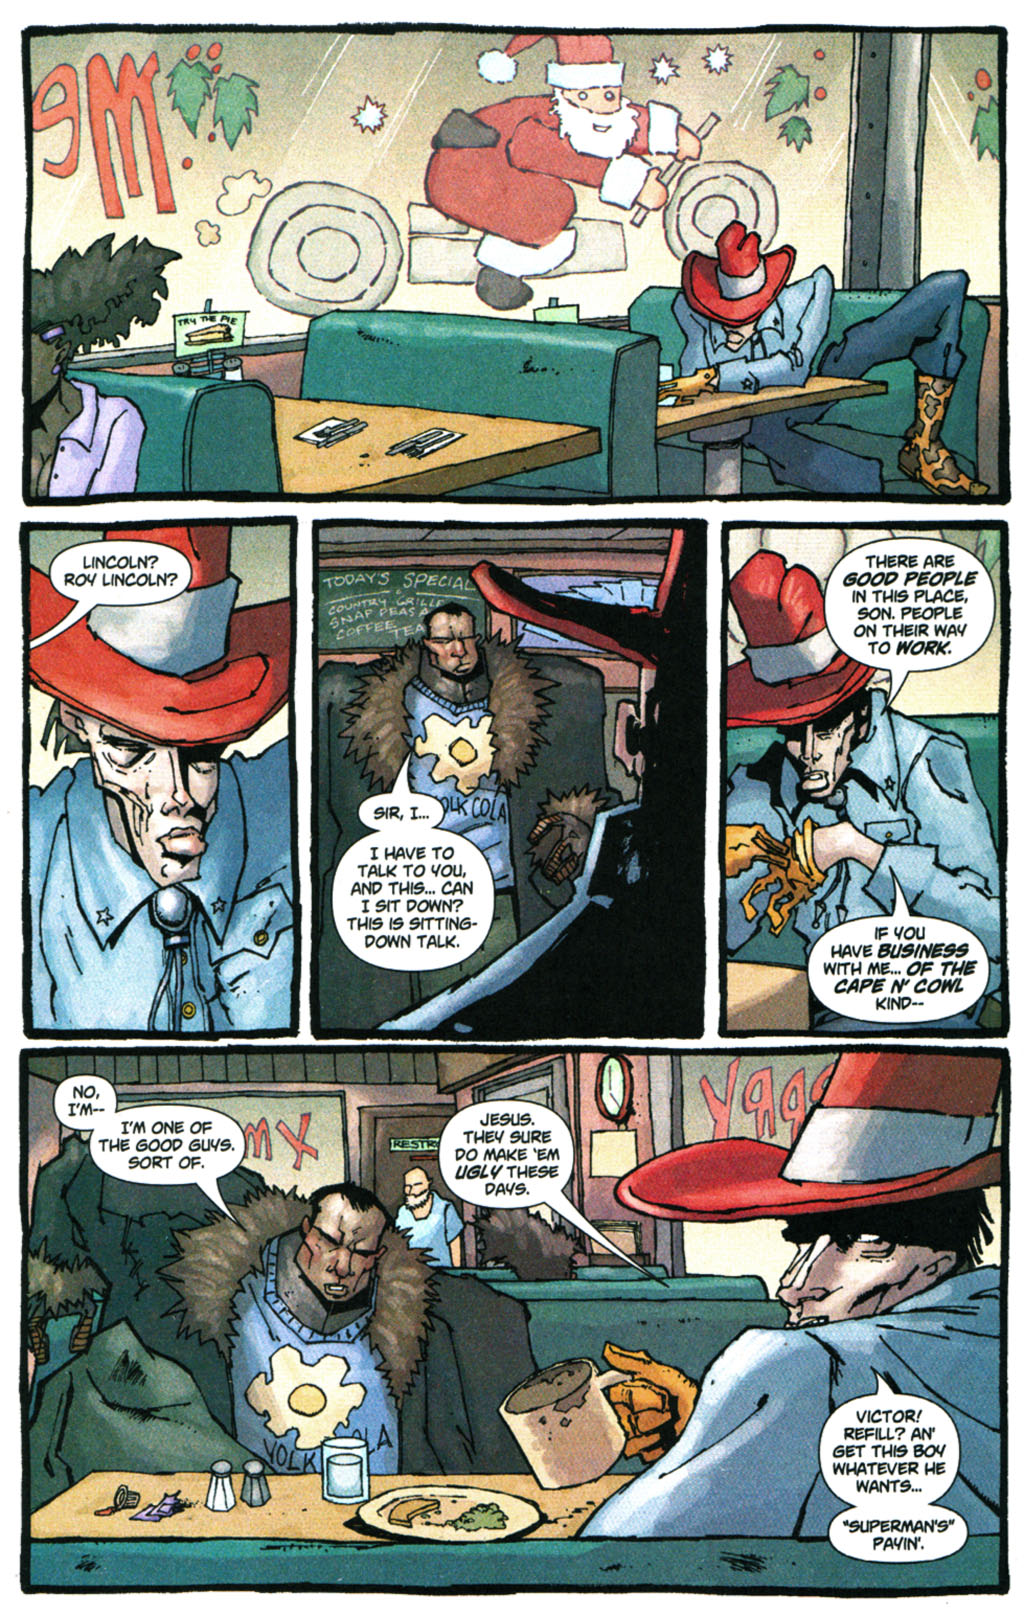 Read online Enginehead comic -  Issue #5 - 16